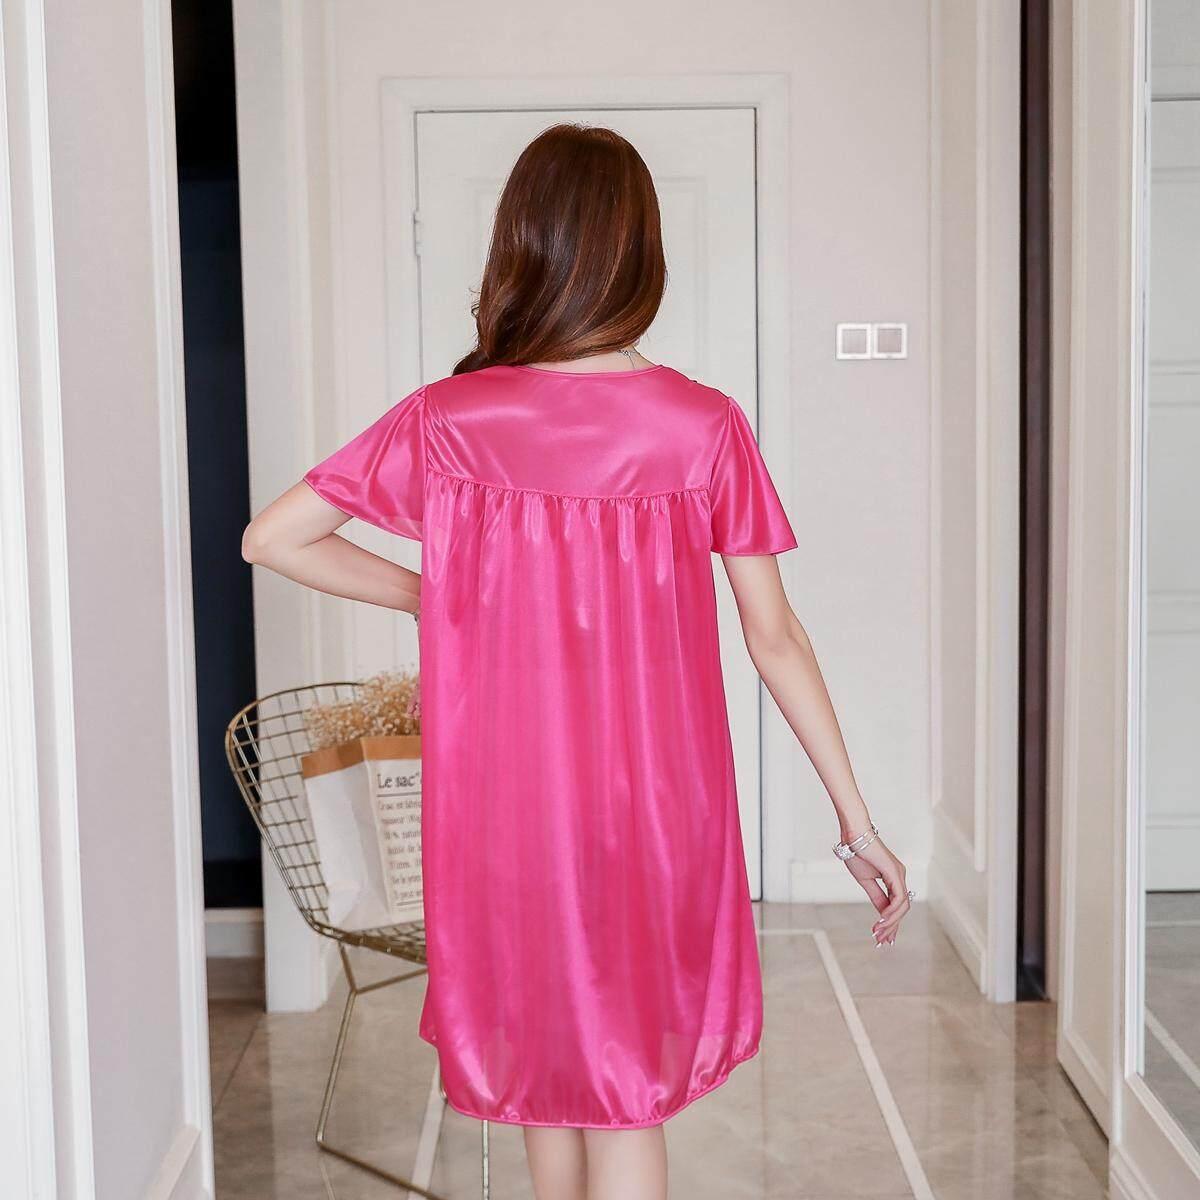 【LIMITED & READY 4 YOU】Wonderful Women Sexy Flower Design Dress Pyjamas With Premium Grade Quality Silk( (Pink/Blue/Grey/Rose Red- Free Size)